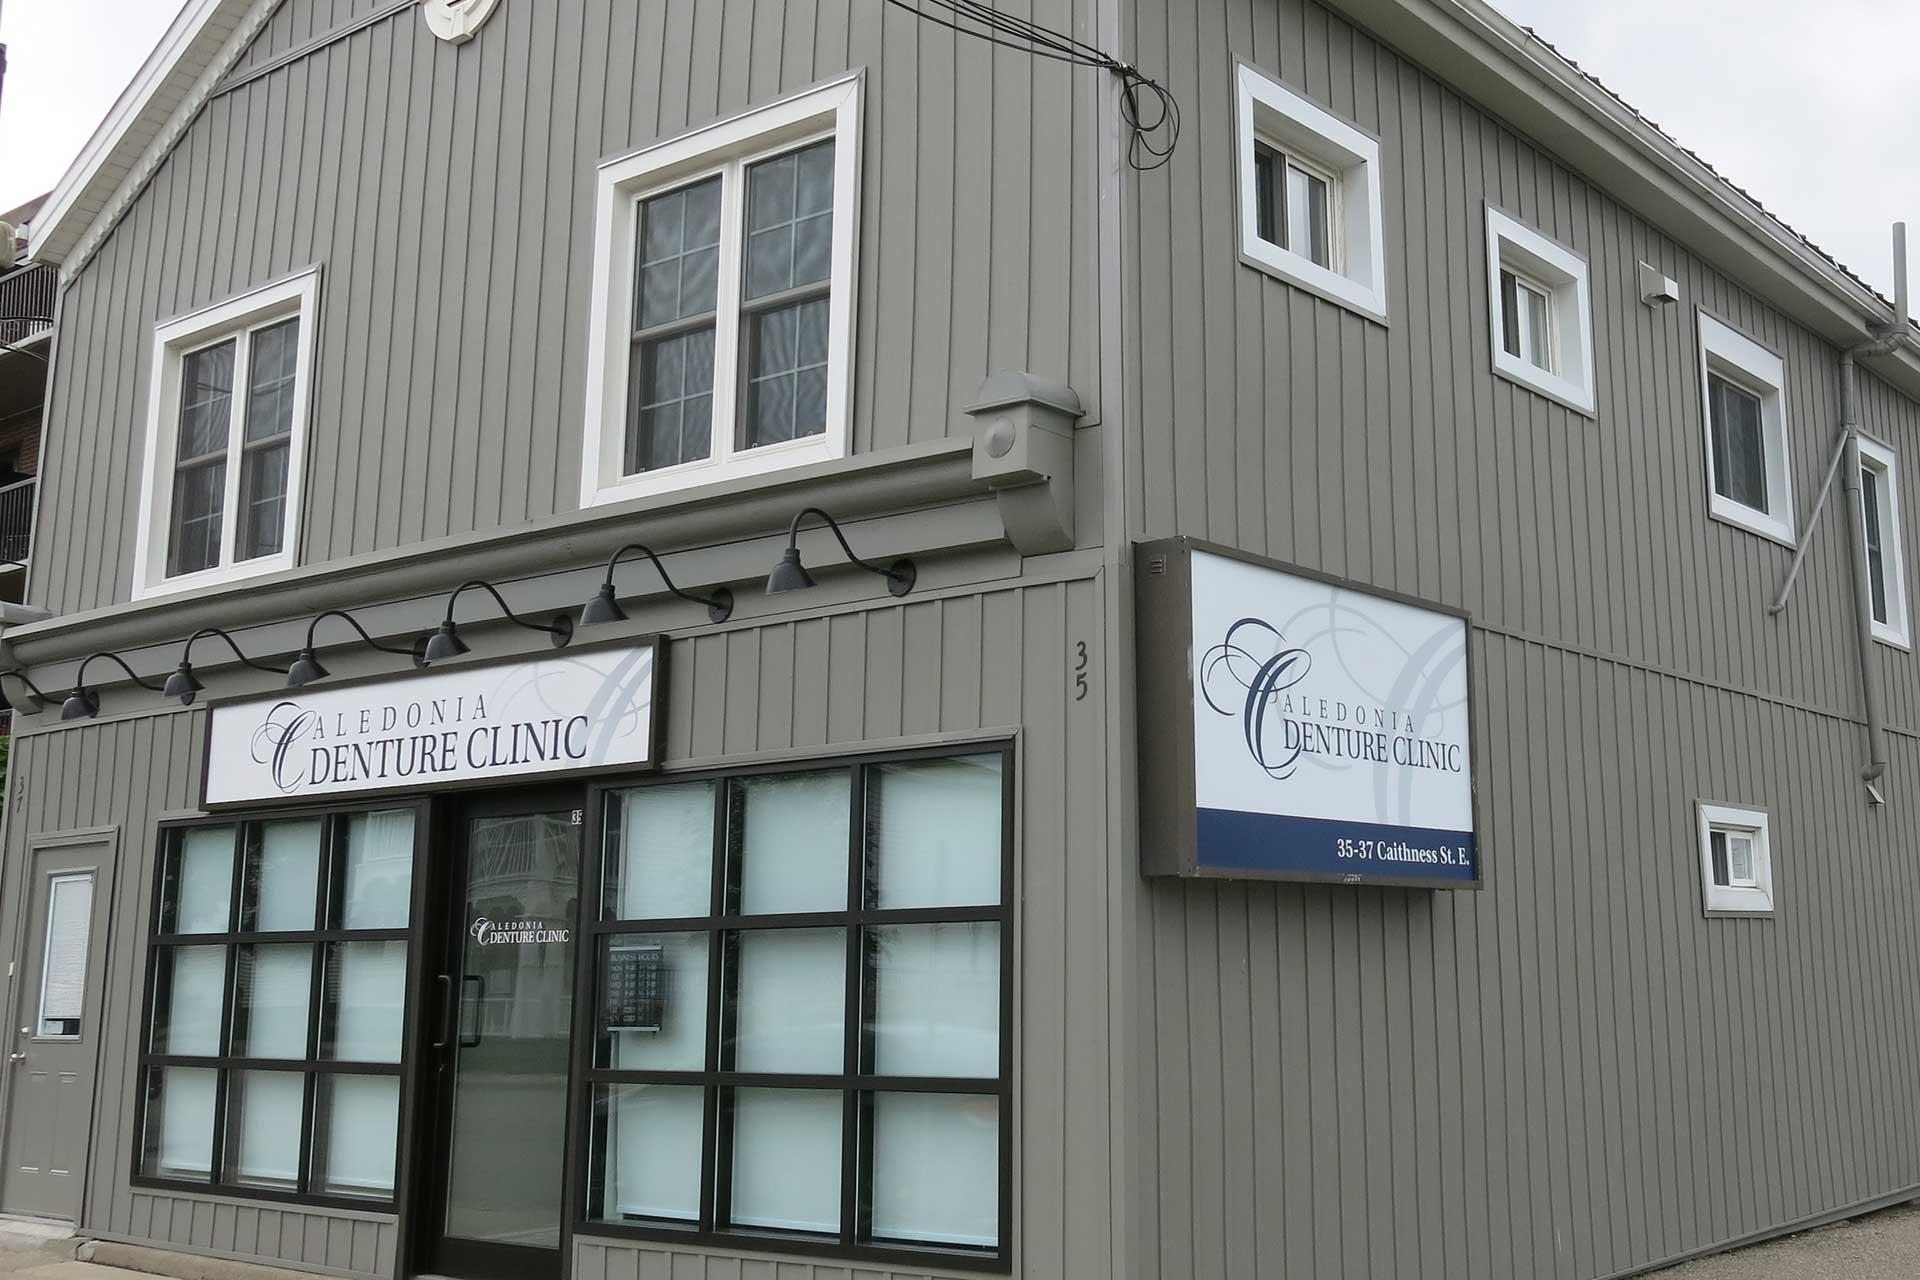 Exterior photo of Caledonia Denture Clinic Building